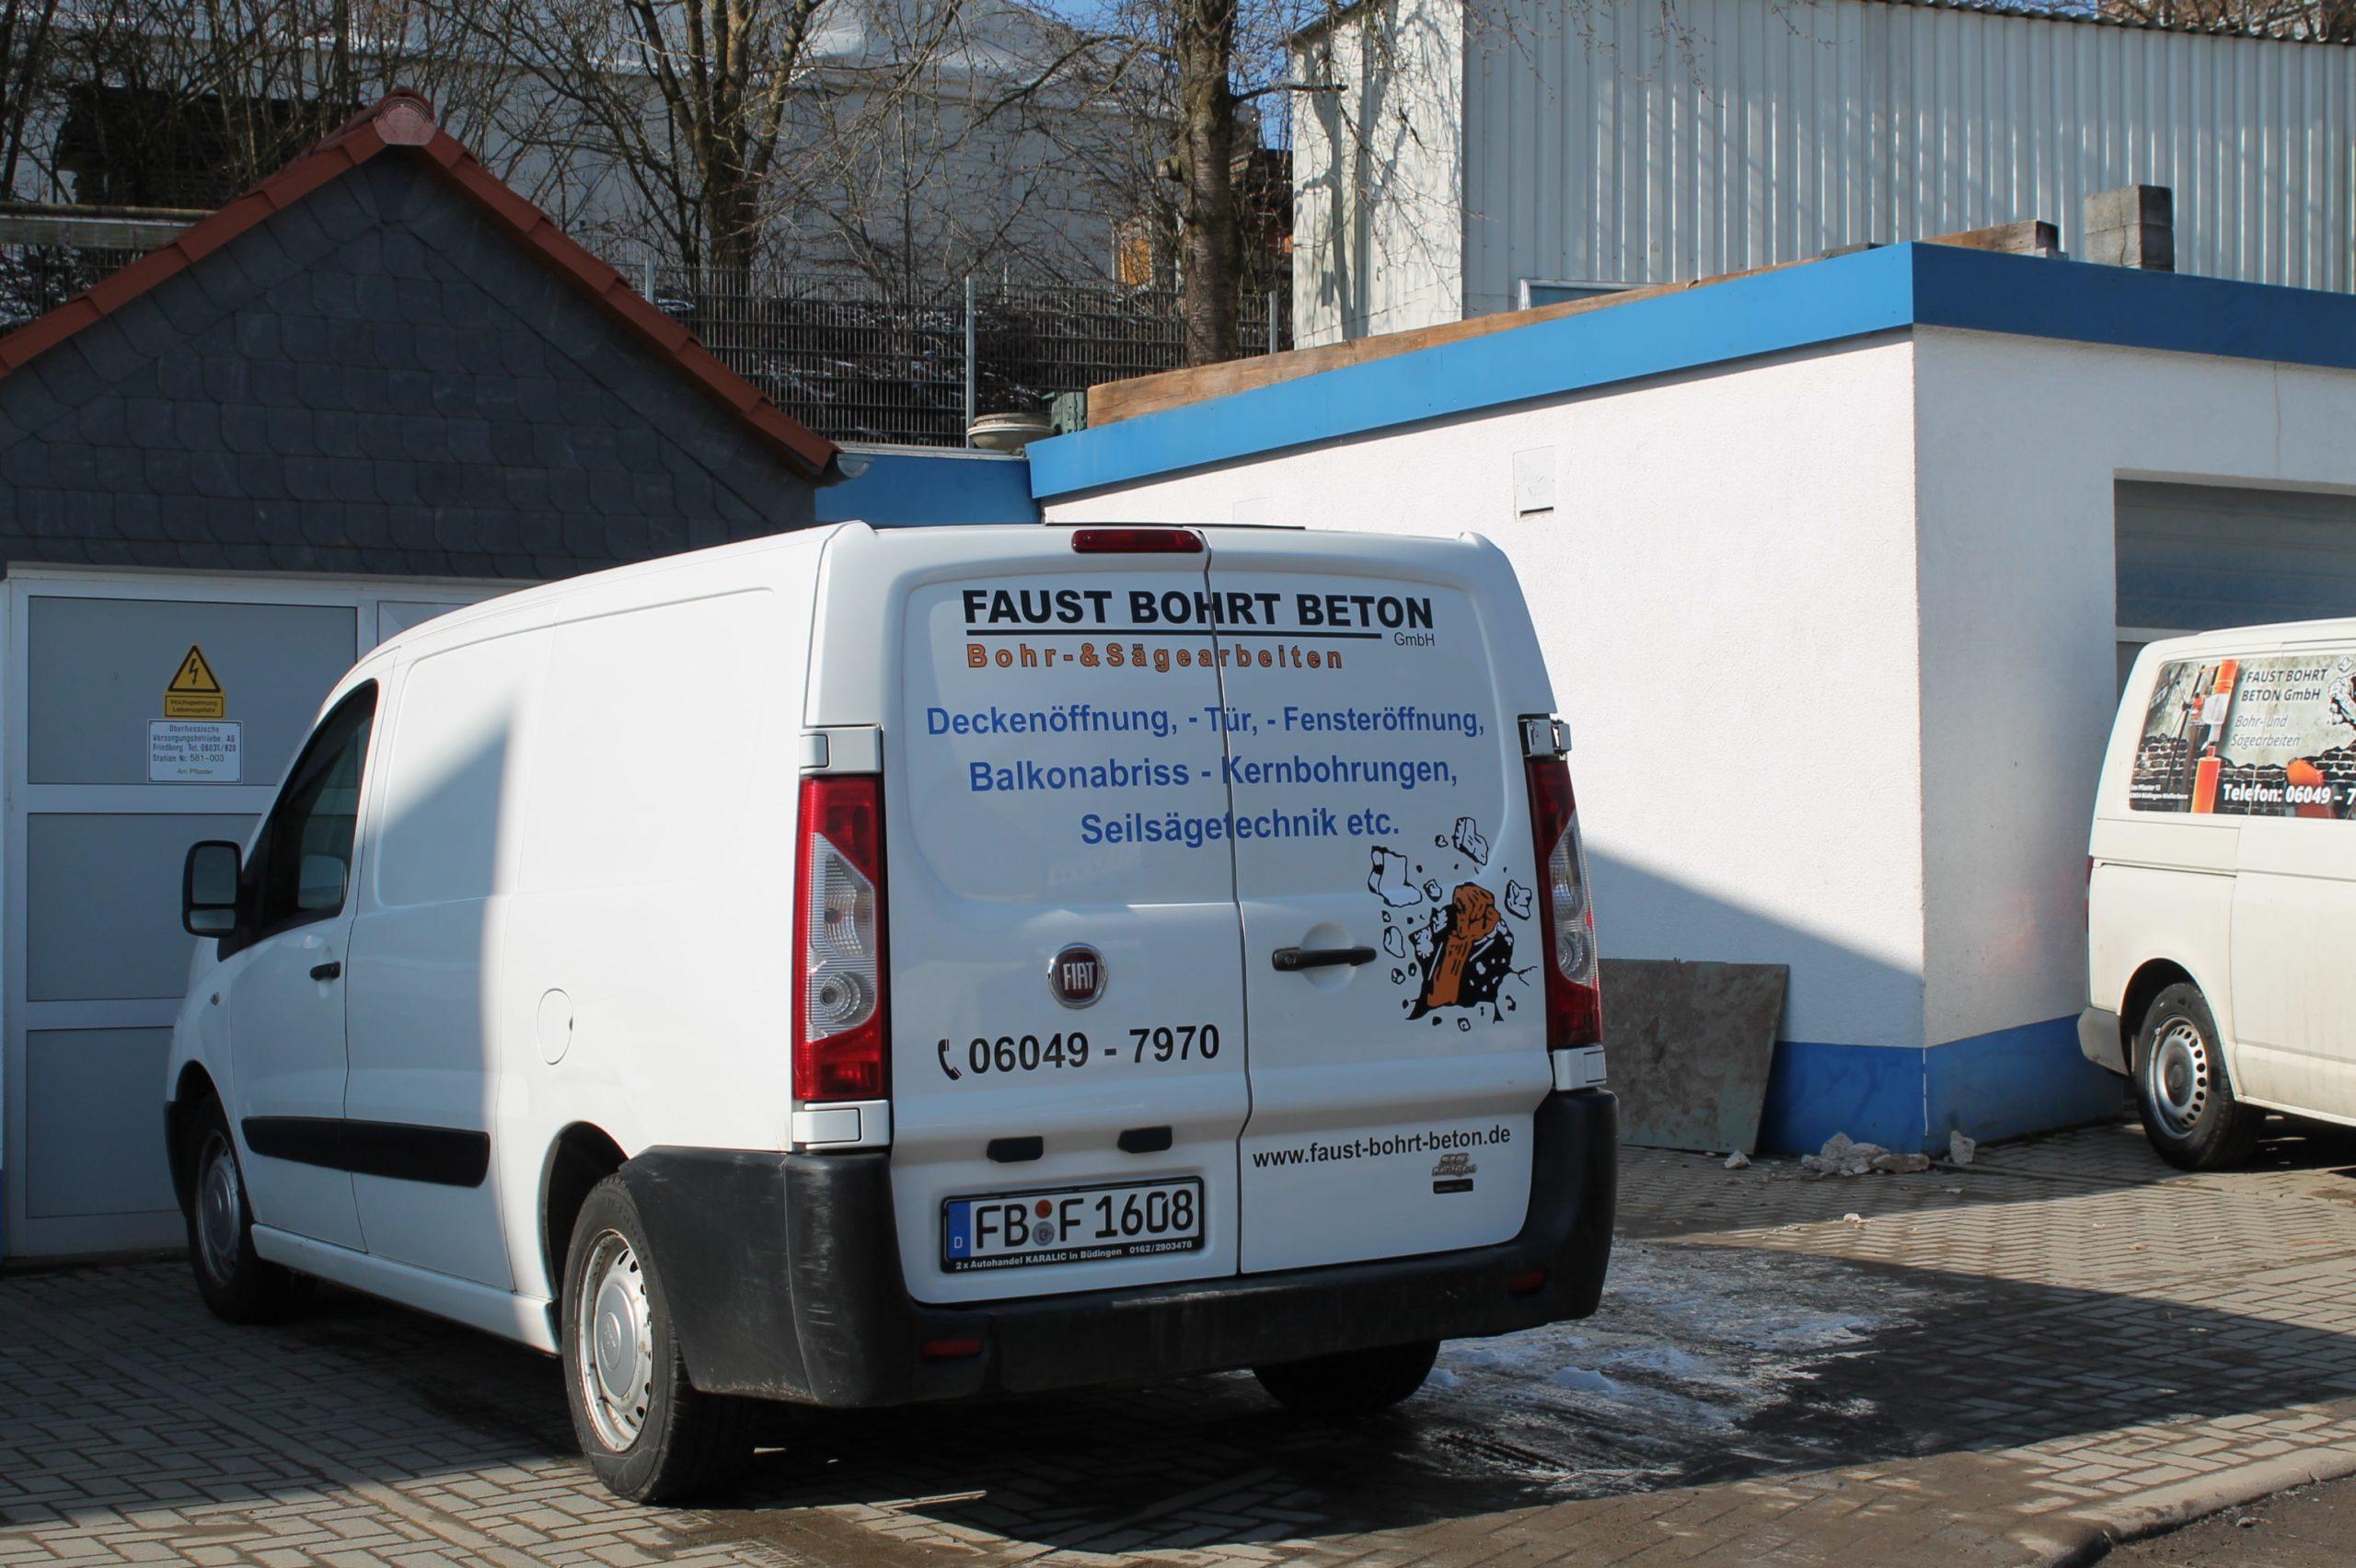 Faust bohrt Beton Fuhrpark 1